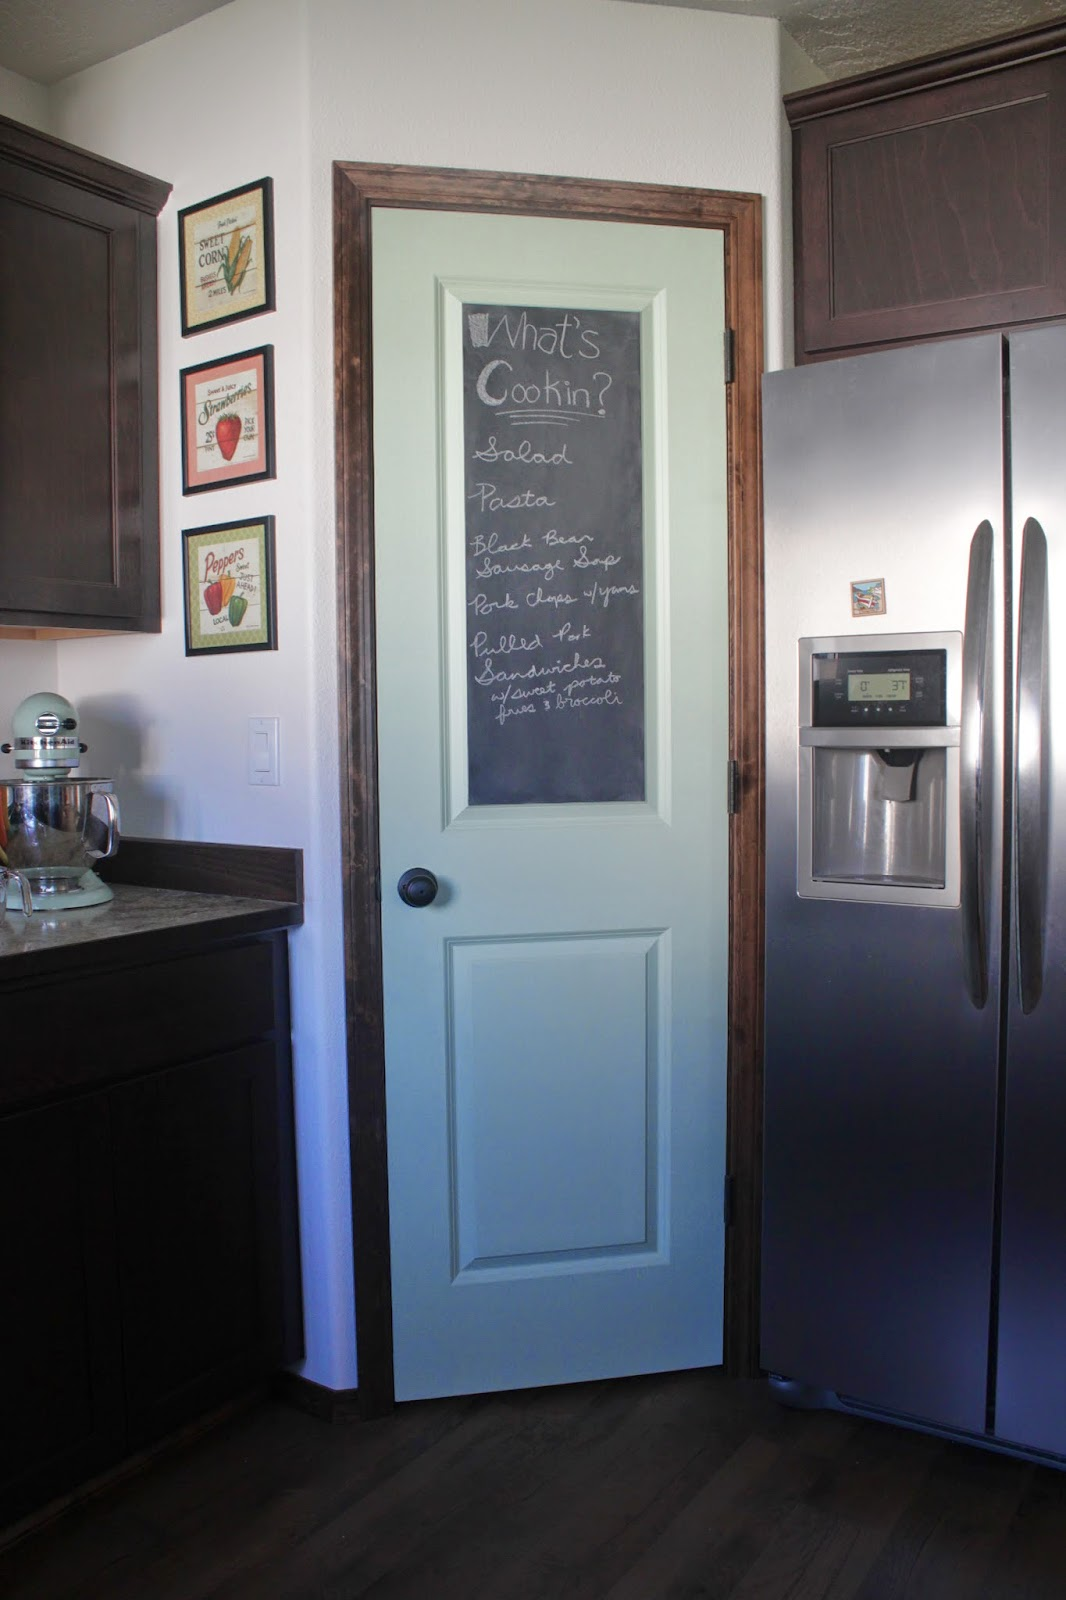 Chalkboard Pantry Door homeiswheretheheartis8410.blogspot.com